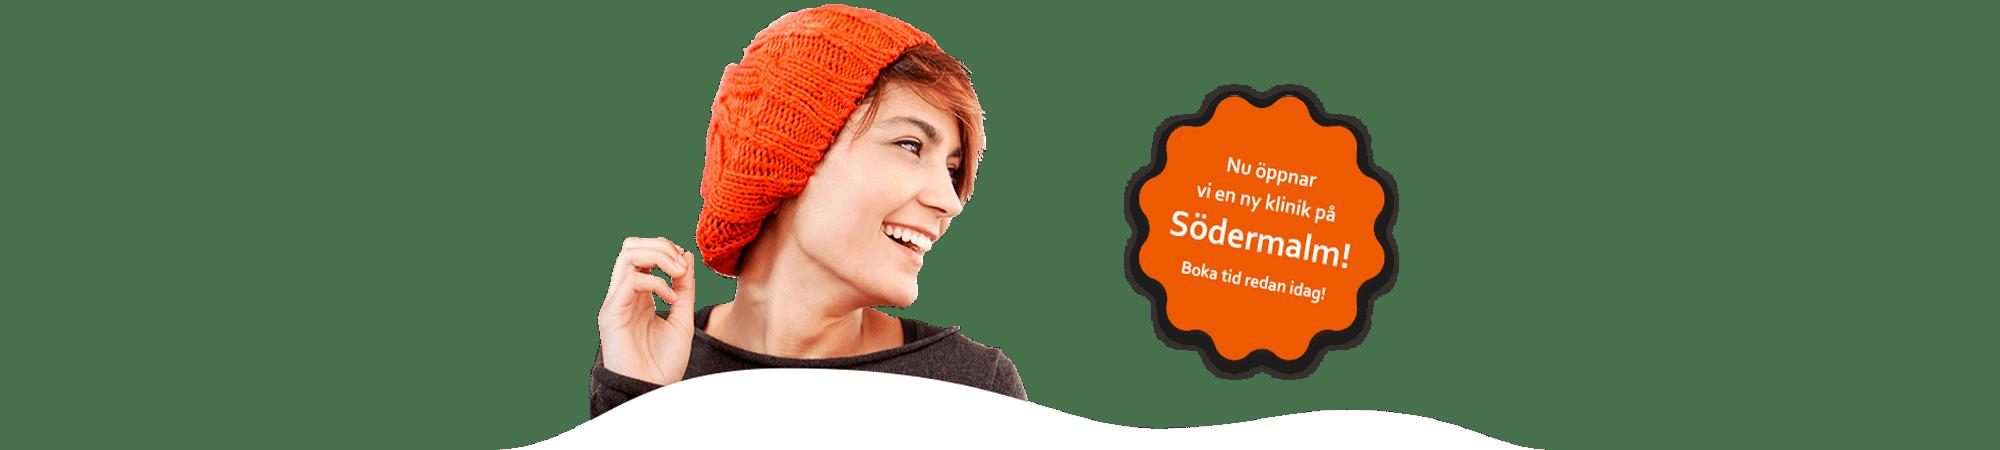 top-soder-2000x450